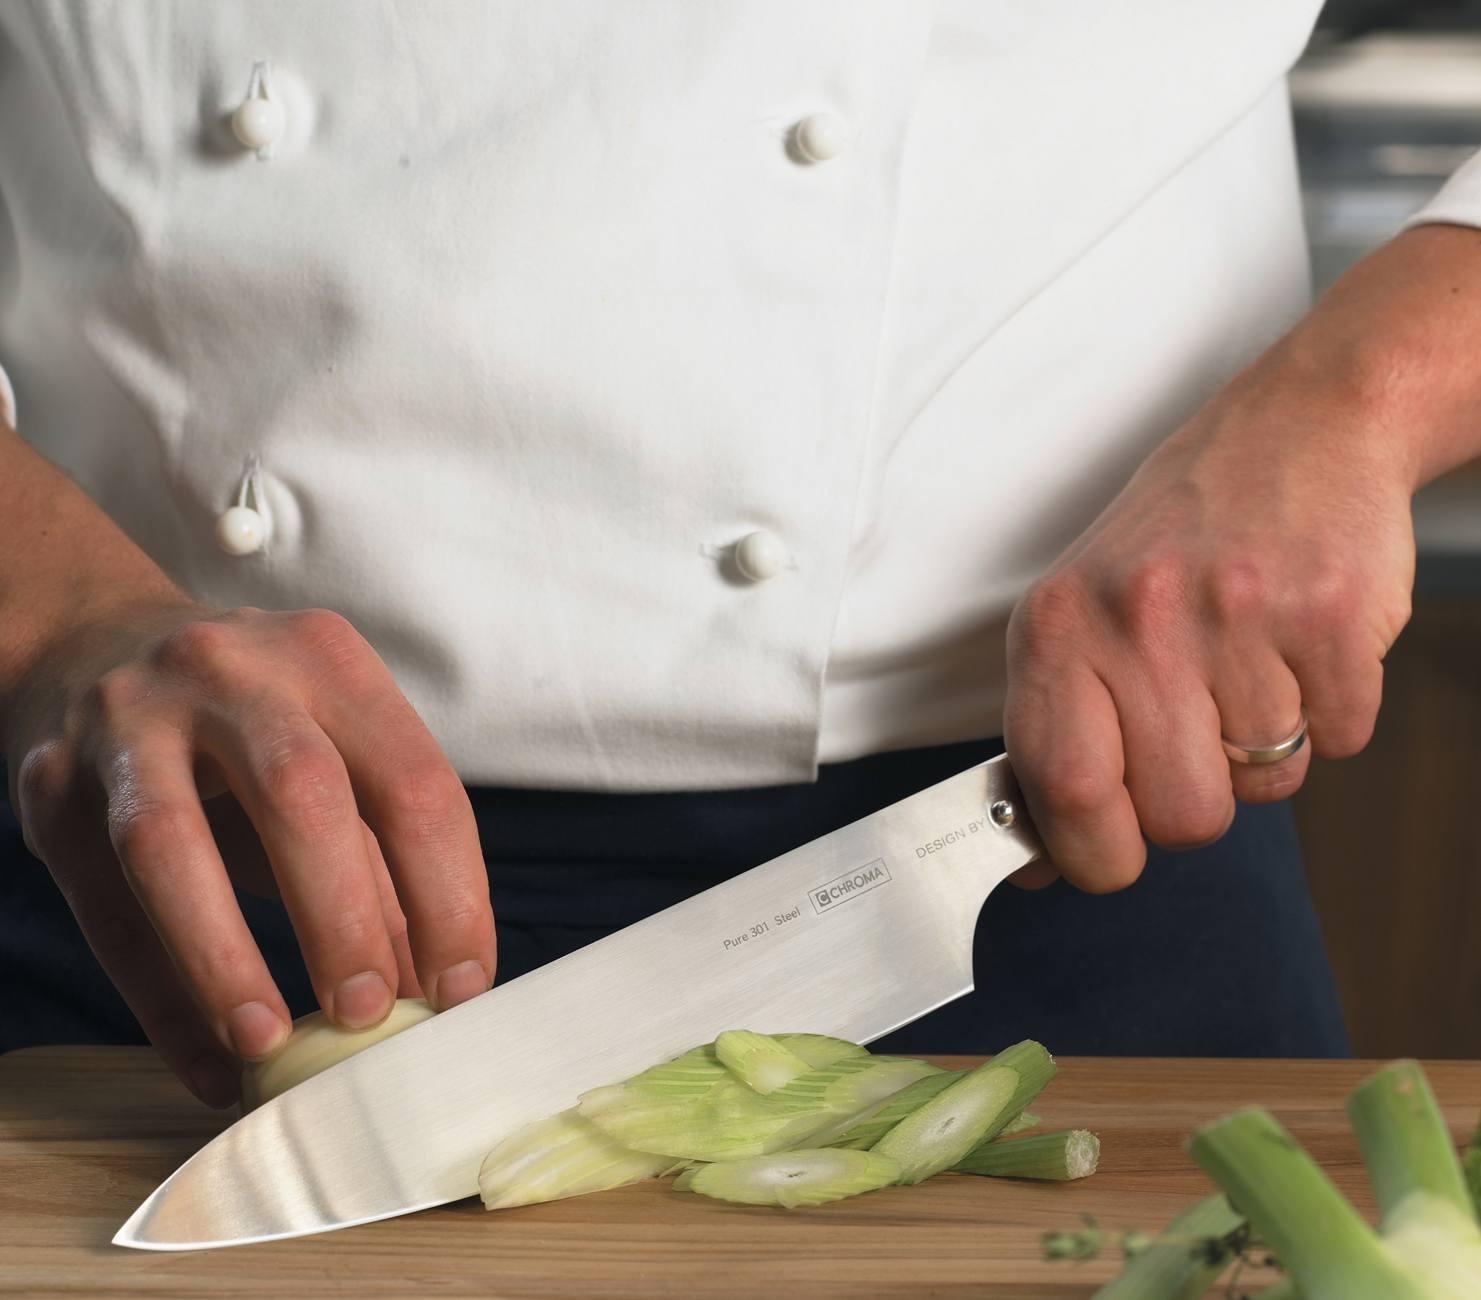 Basic Knife Skills: Knife Safety, Knife Care, And Knife Skills: The Basics For